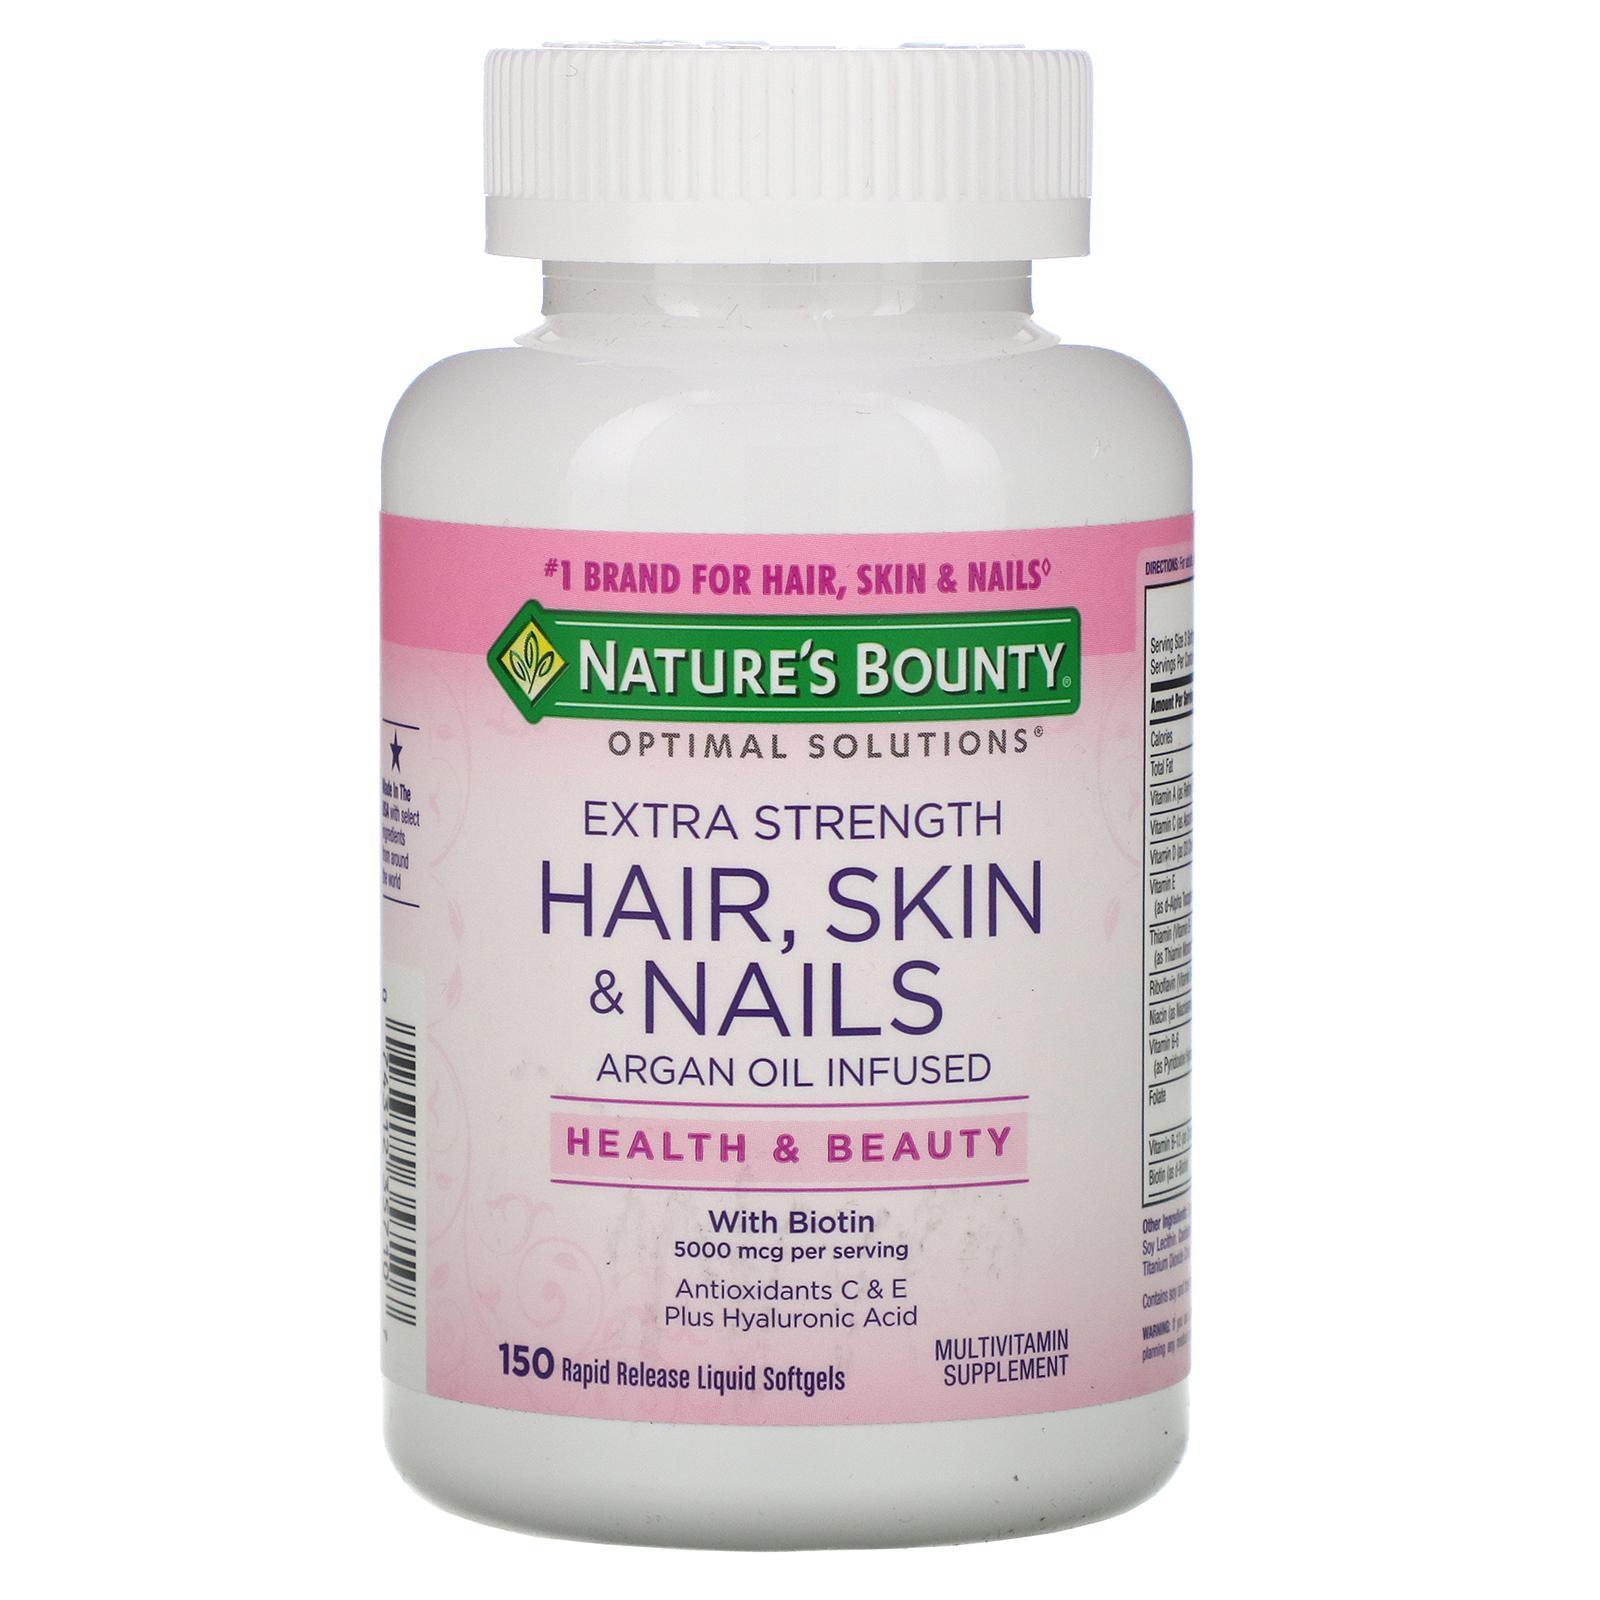 Купить Hair, Skin, Nails Extra Strength Nature's Bounty капсулы 150 шт.